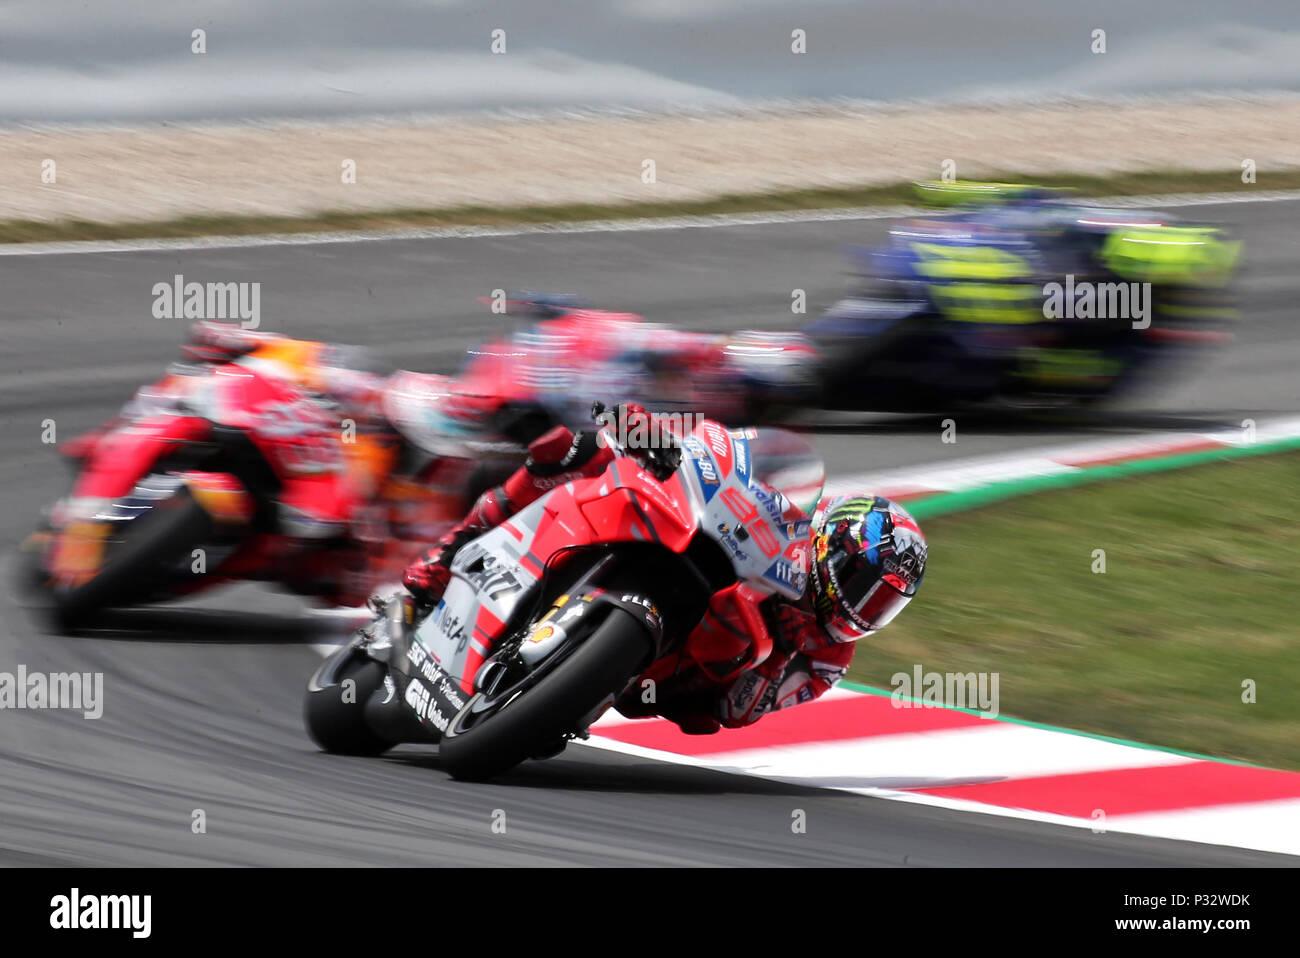 Barcelona -17th June 2018- SPAIN: Jorge Lorenzo (Ducati) during  the GP Catalunya Moto GP, in the Barcelona-Catalunya Circuit, on 17th June 2018. Photo: Joan Valls/Urbanandsport/Cordon Press - Stock Image